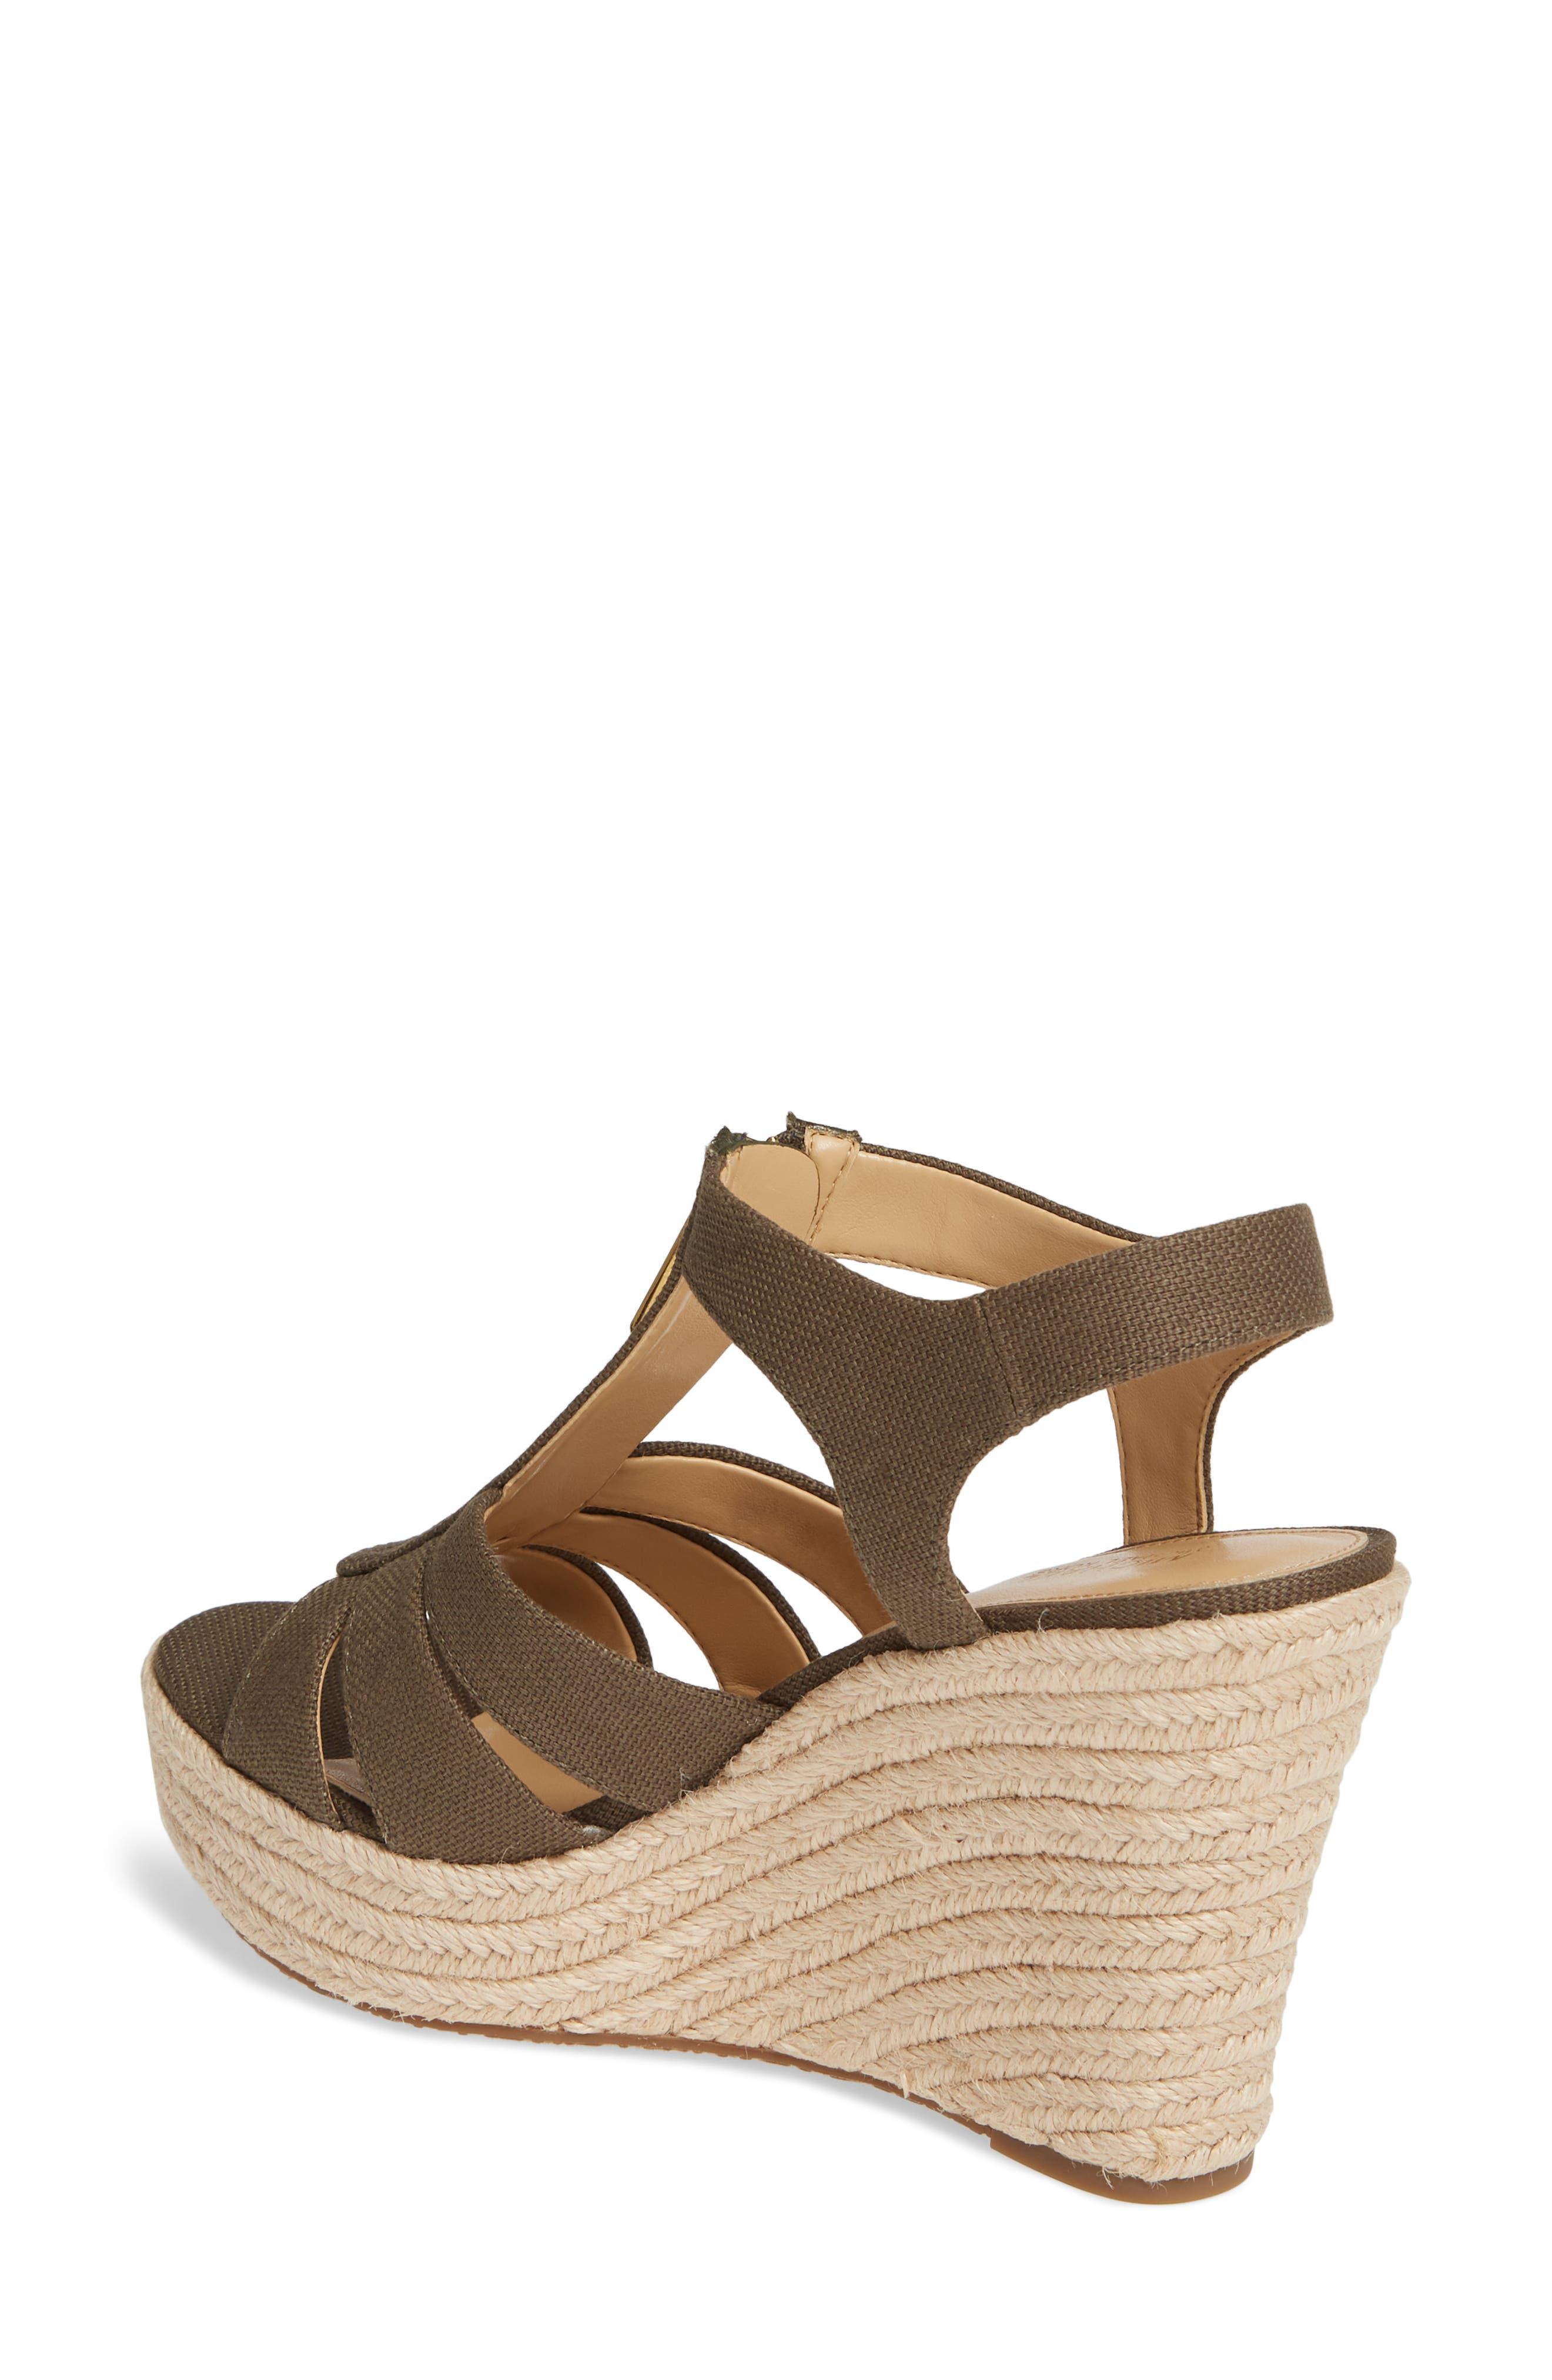 6d03a2978 Women s T-Strap Wedge Sandals